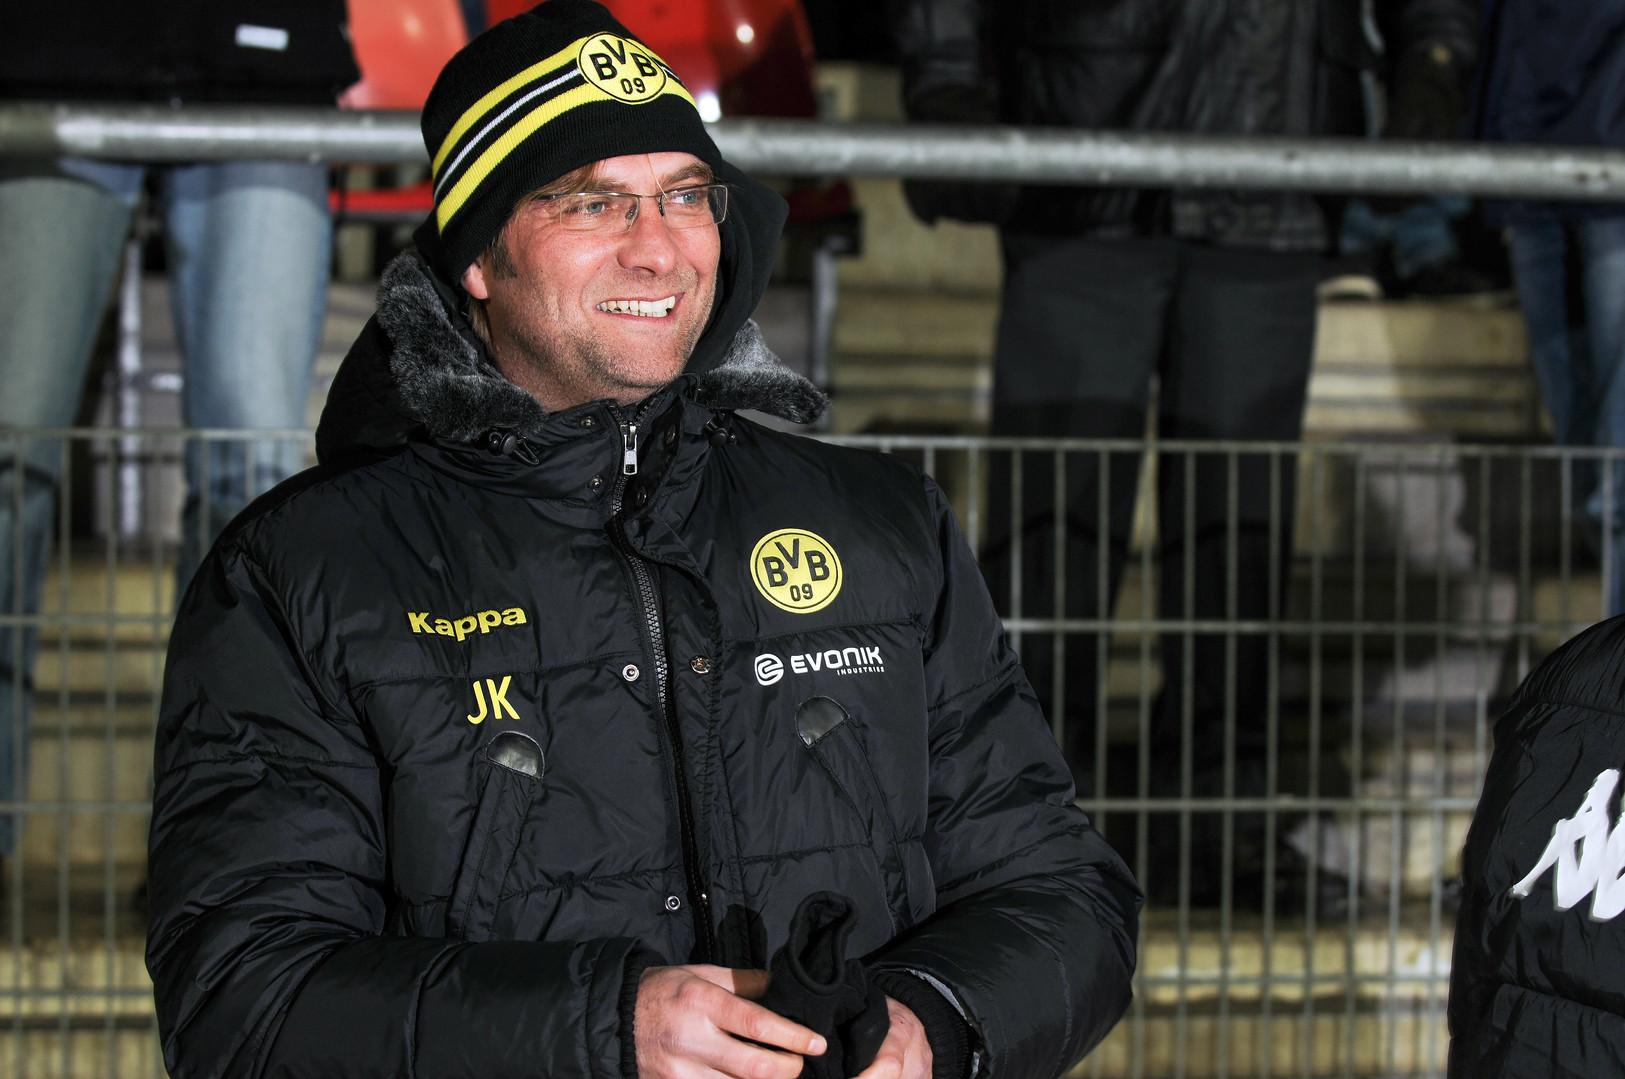 FUSSBALL BvB JÜRGEN KLOPP